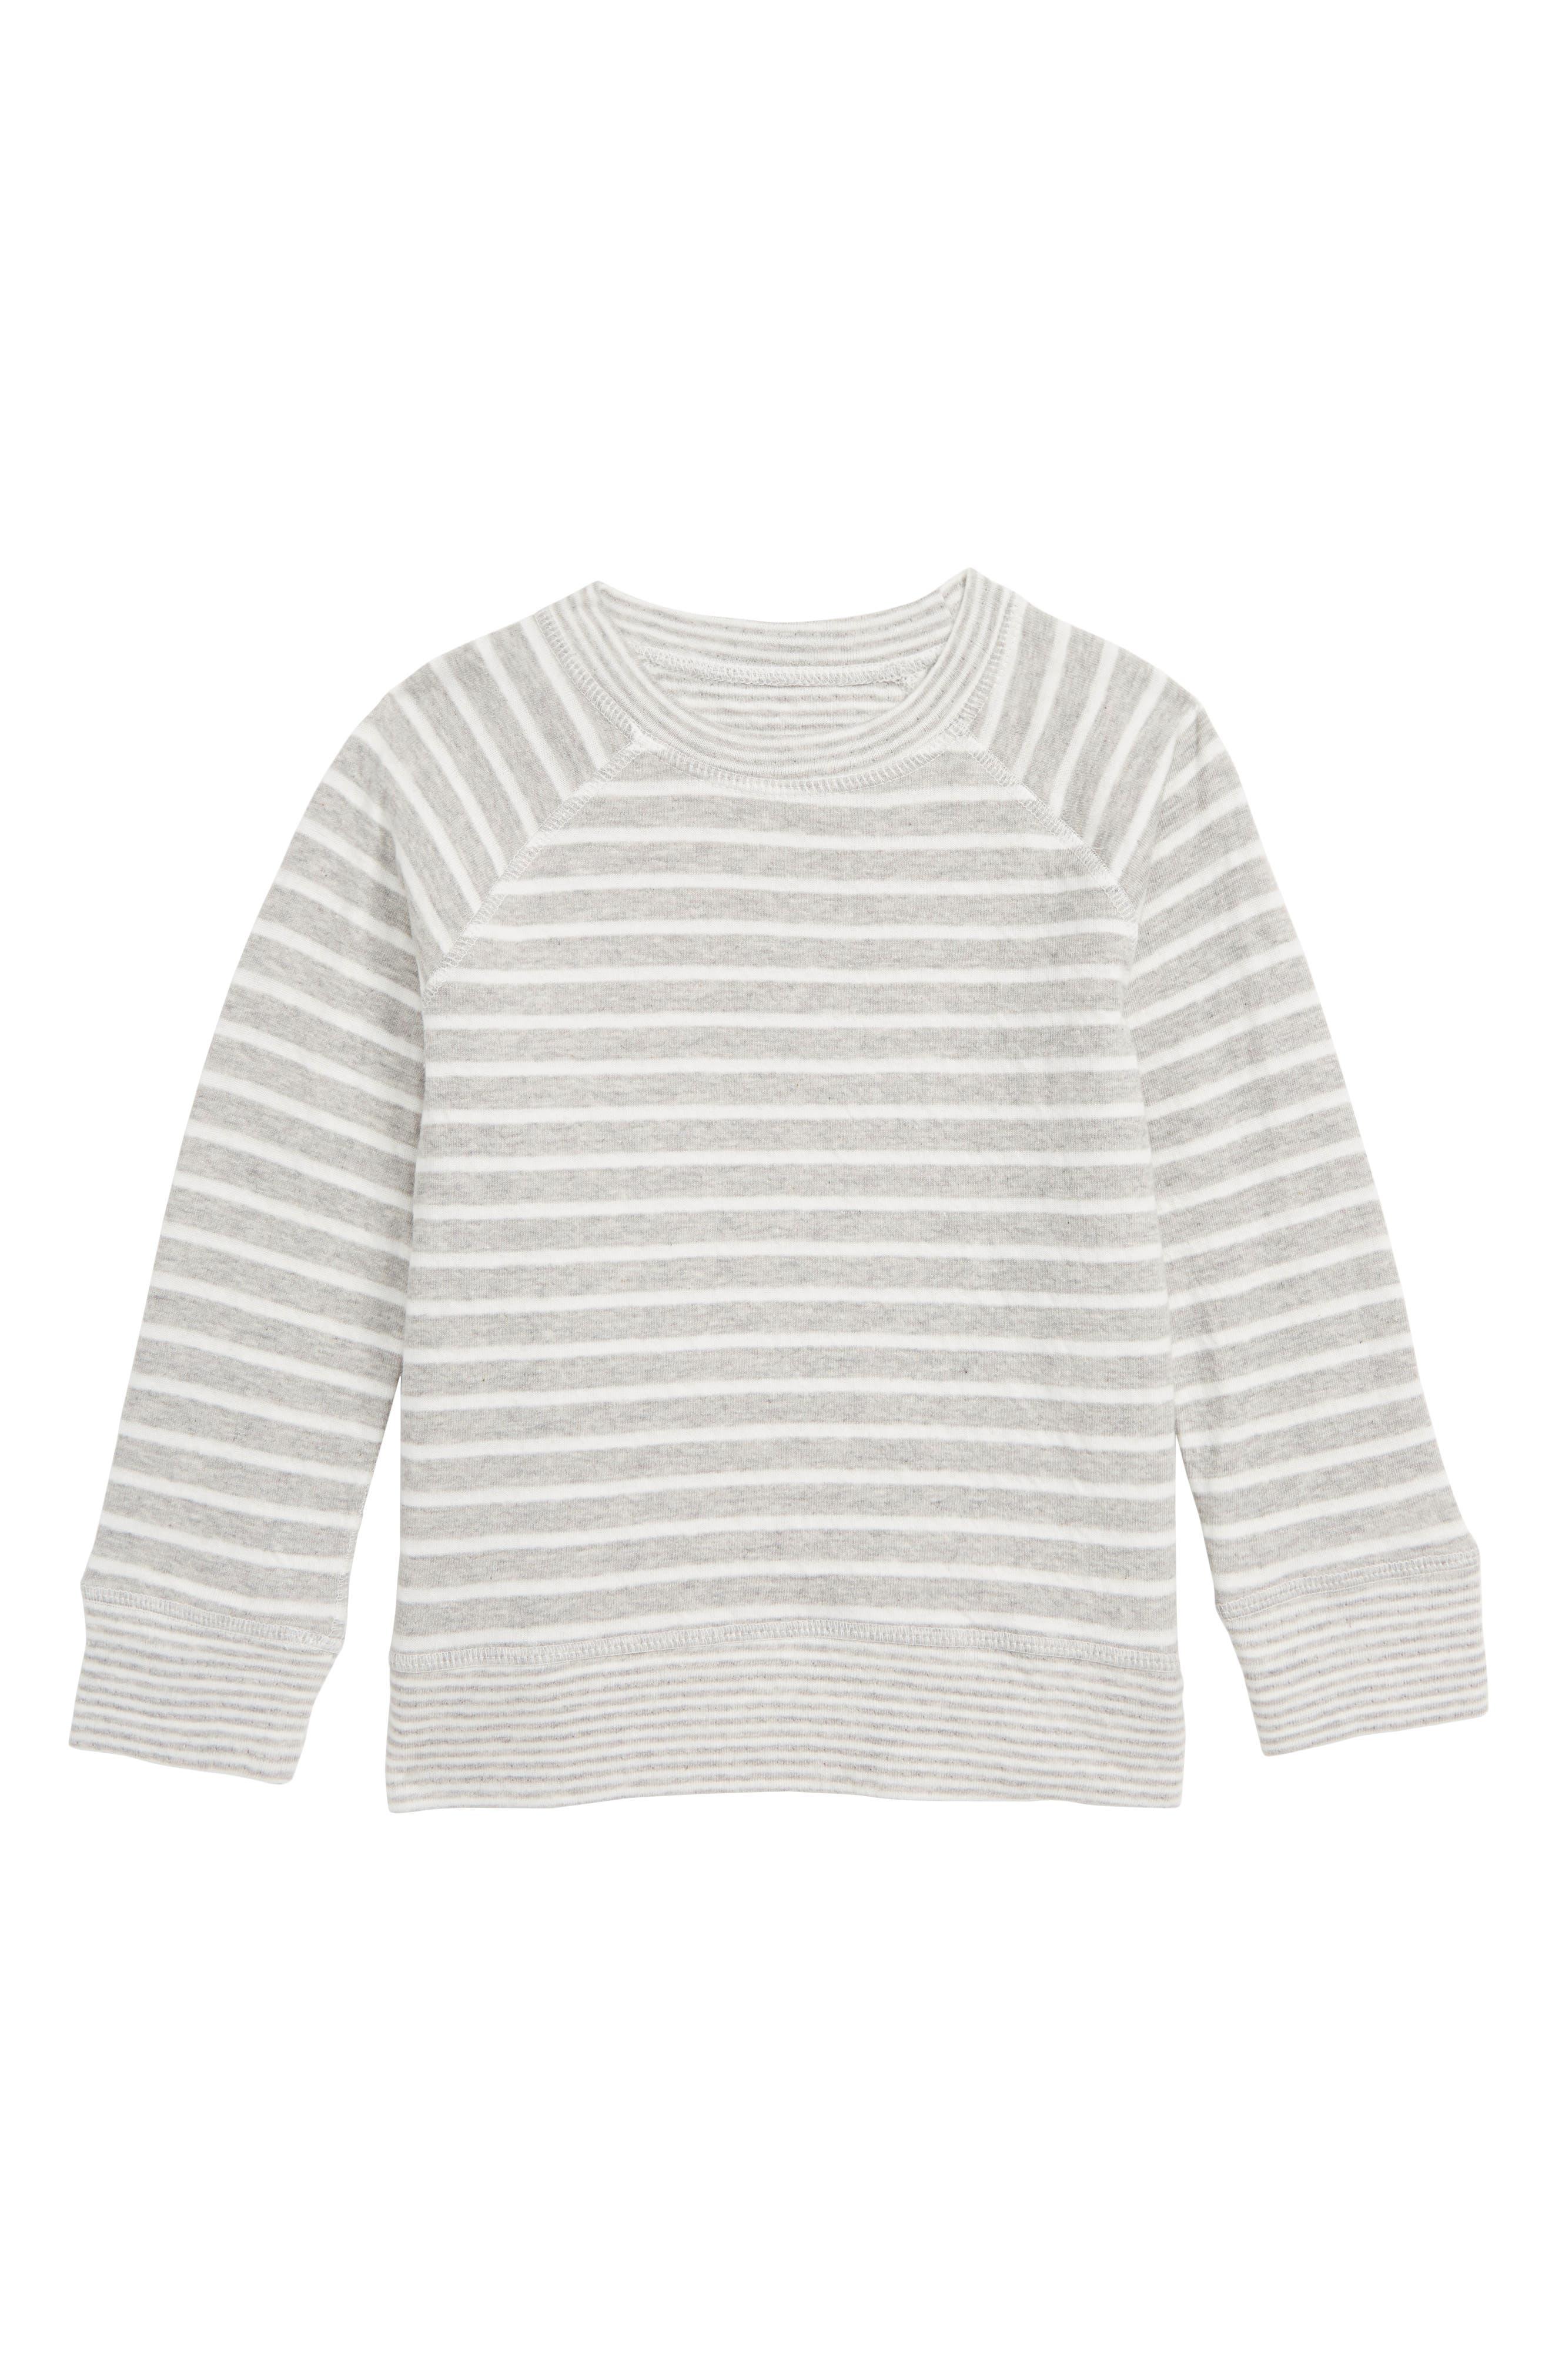 Double Layer Reversible T-Shirt, Main, color, GREY MARL/ ECRU